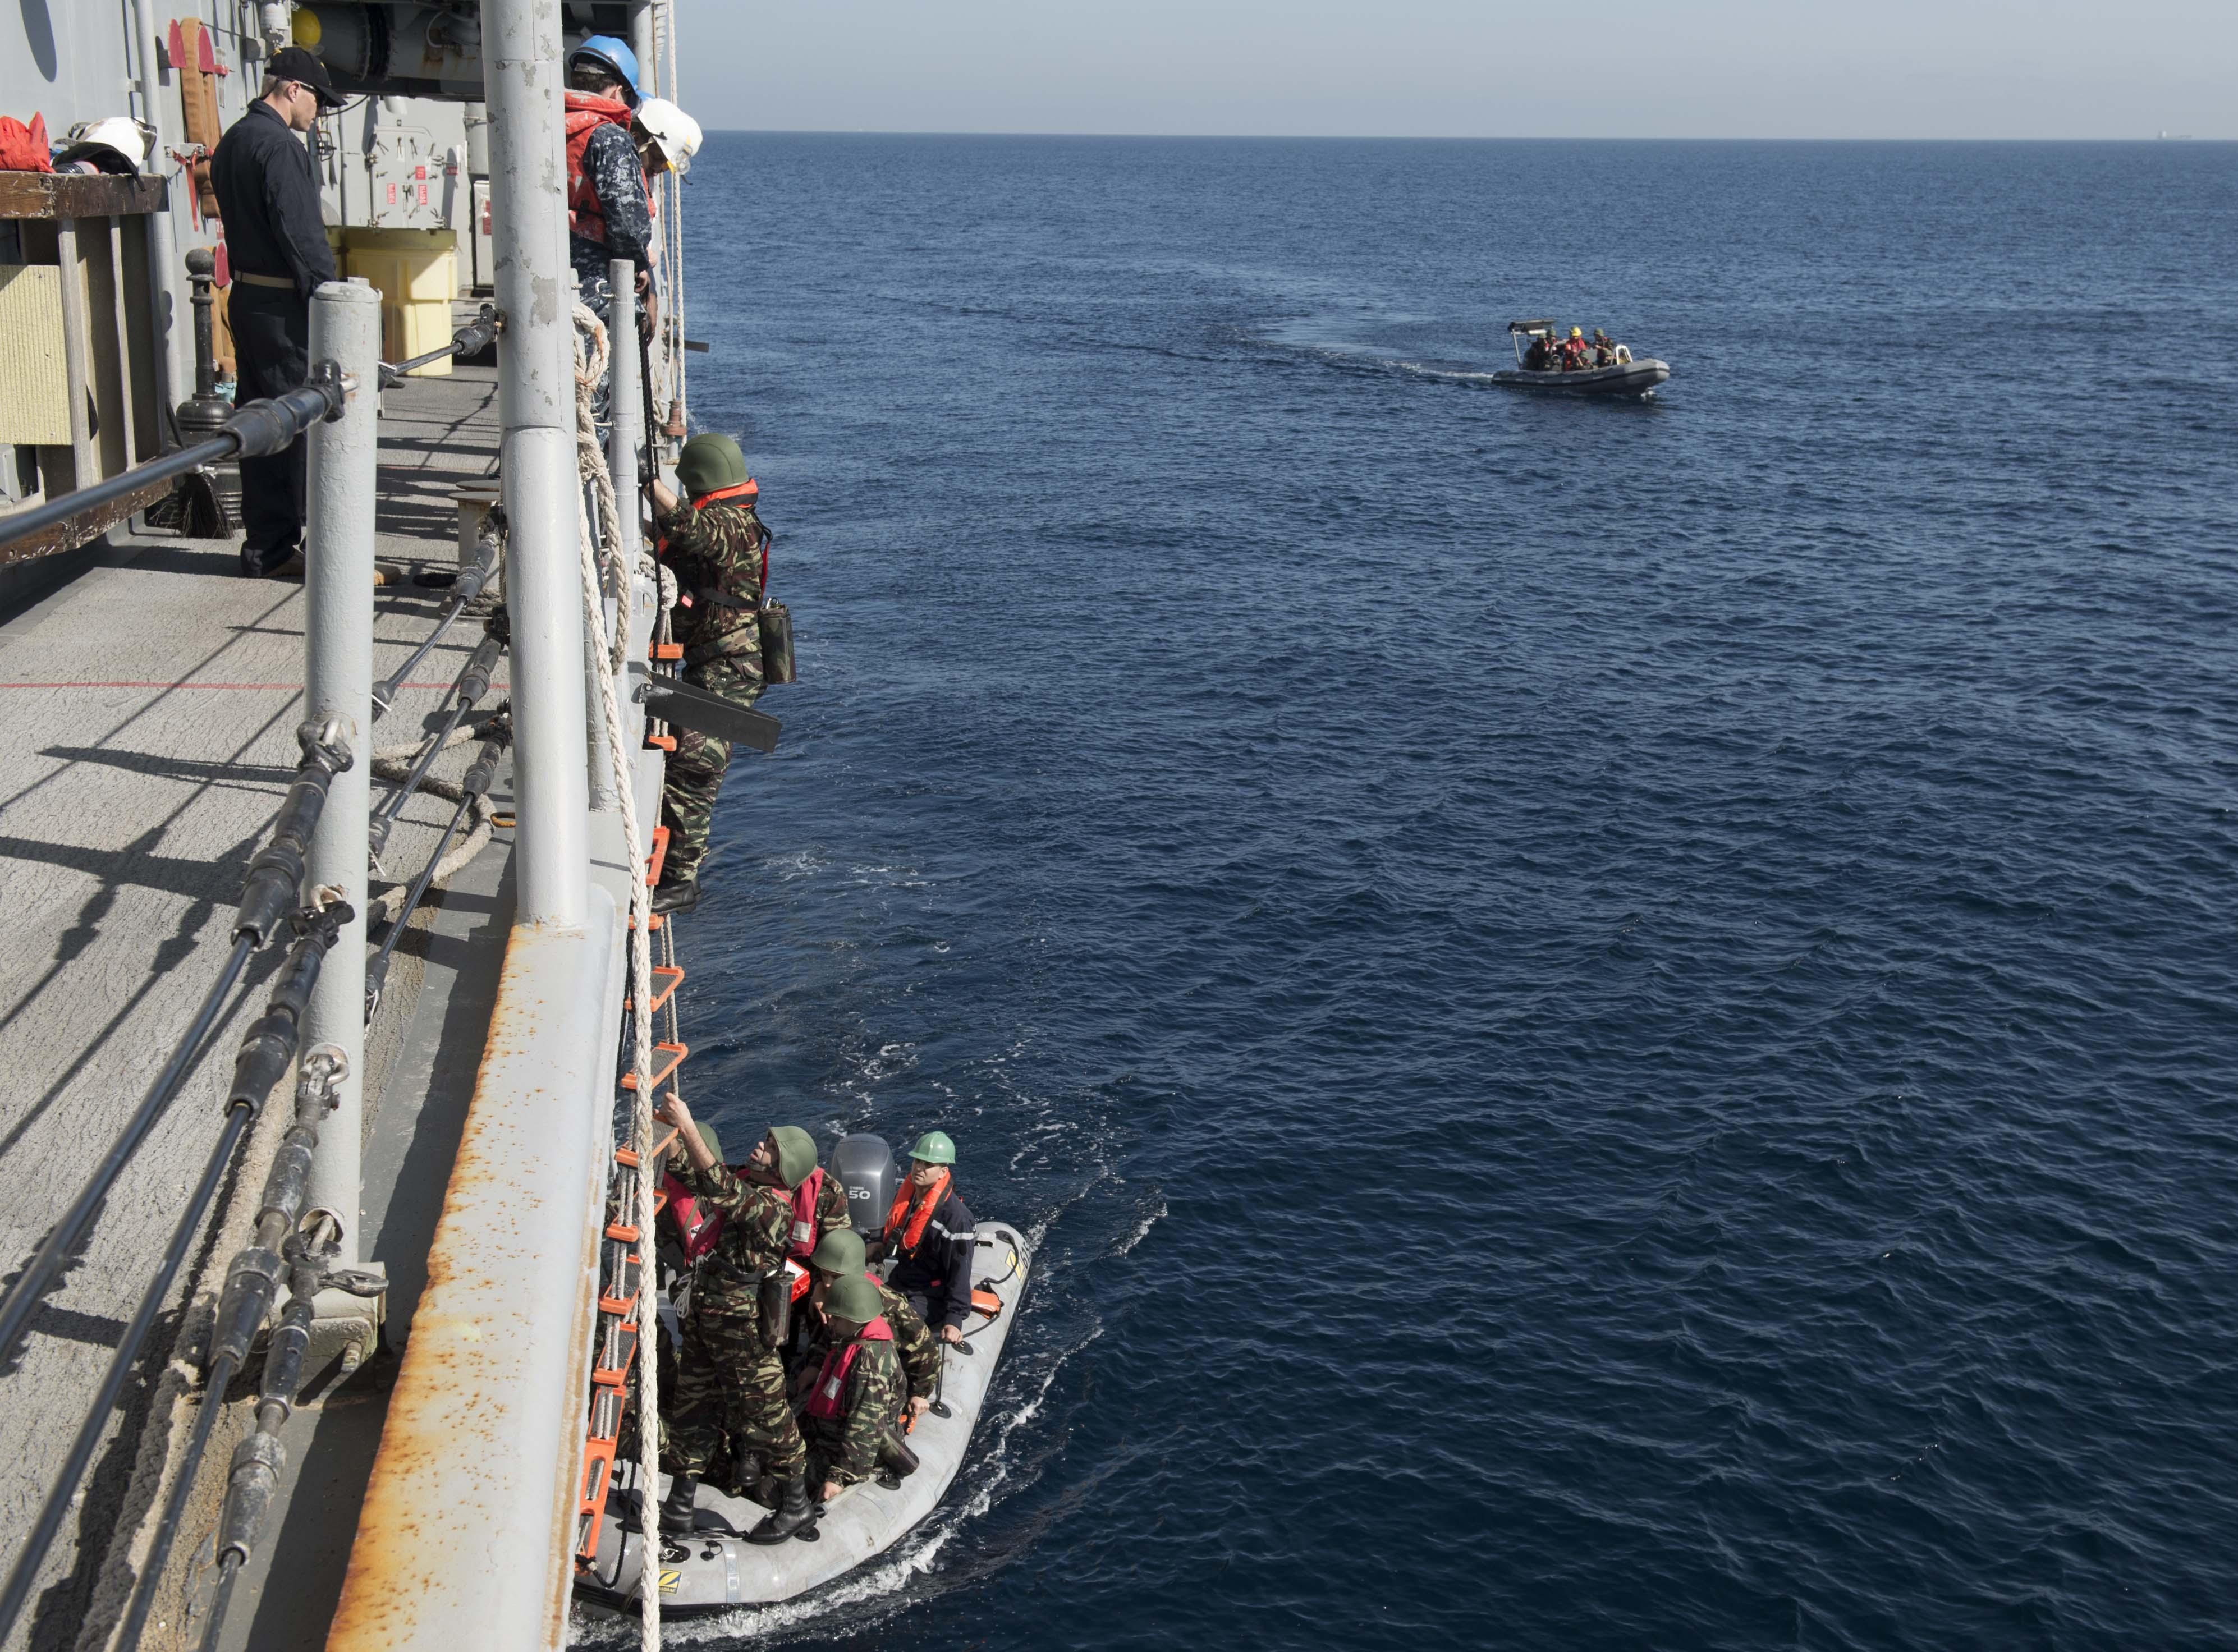 PASSEX 2014-1 ( USS Elrod (FFG55) et RMN Allal Ben Abdellah (615) ) 12363878433_5ff1898904_o